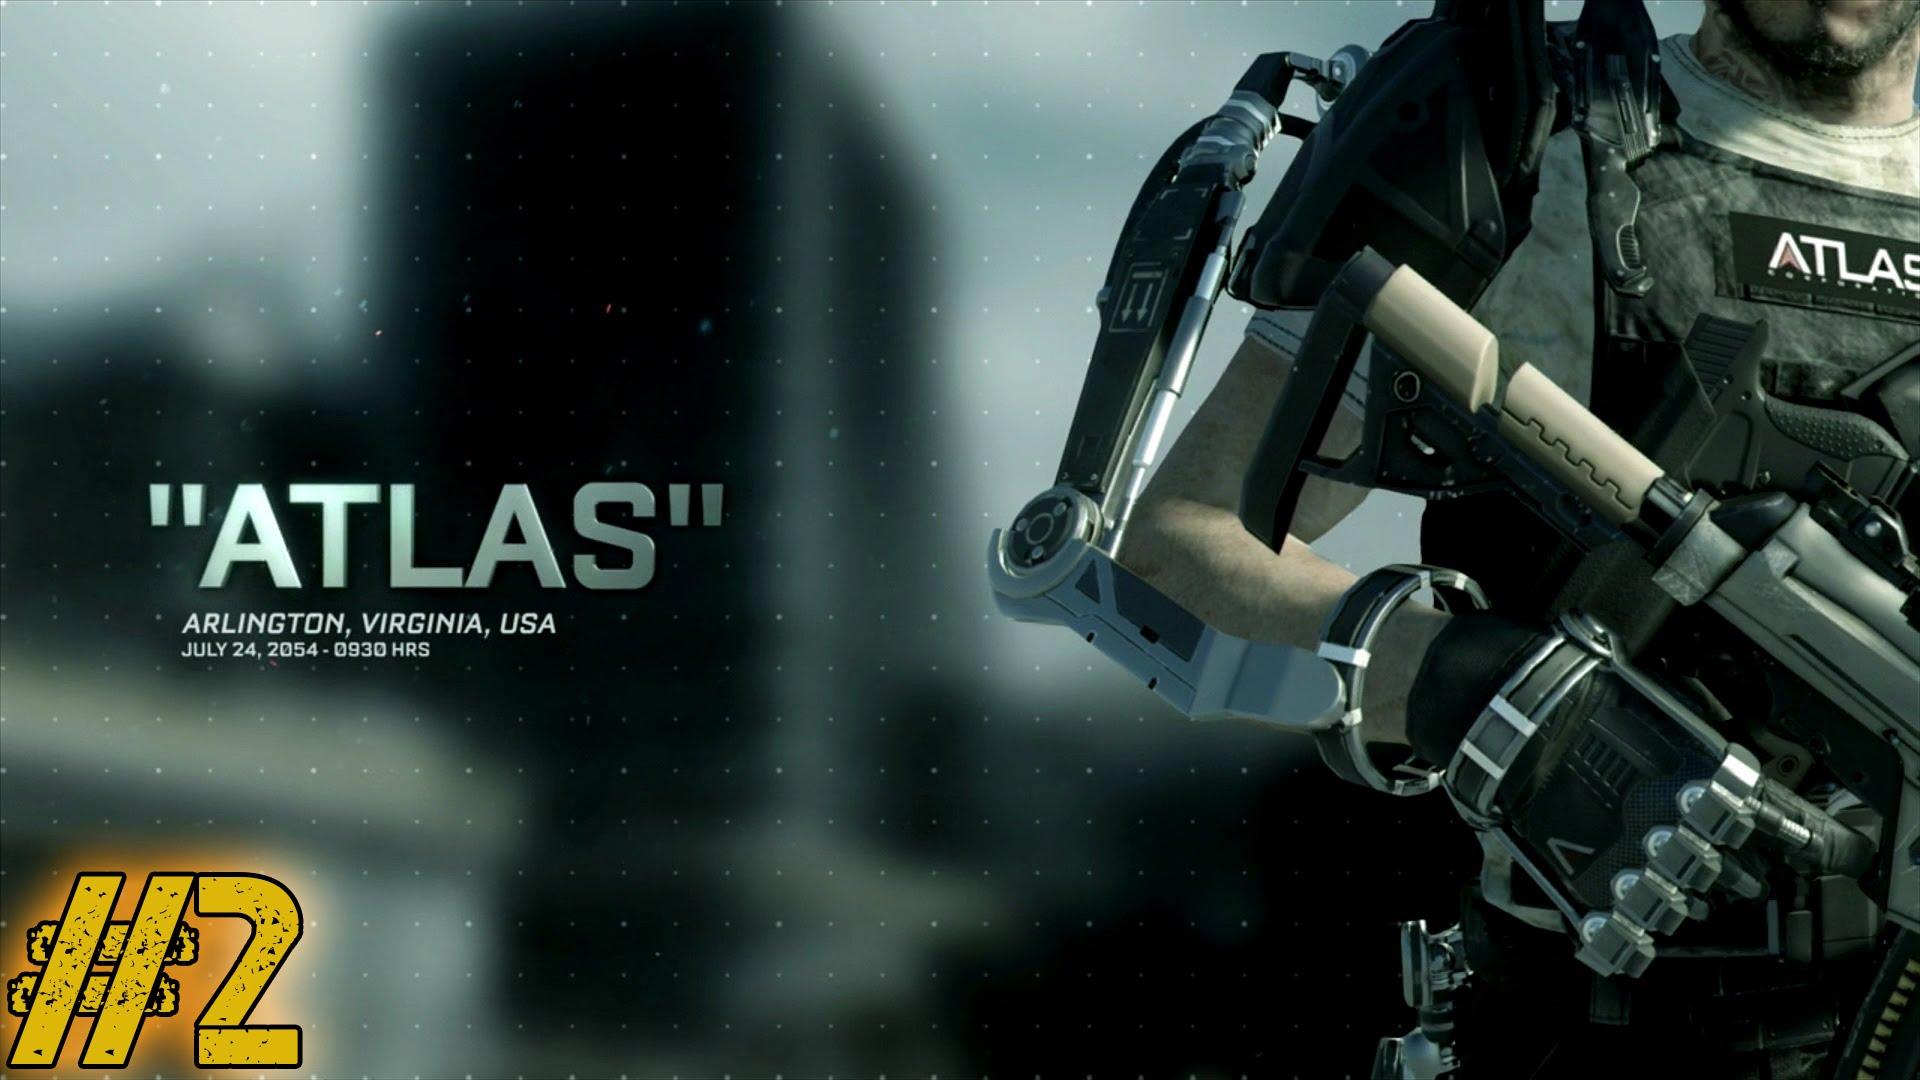 Call of Duty Atlas Wallpaper - WallpaperSafari